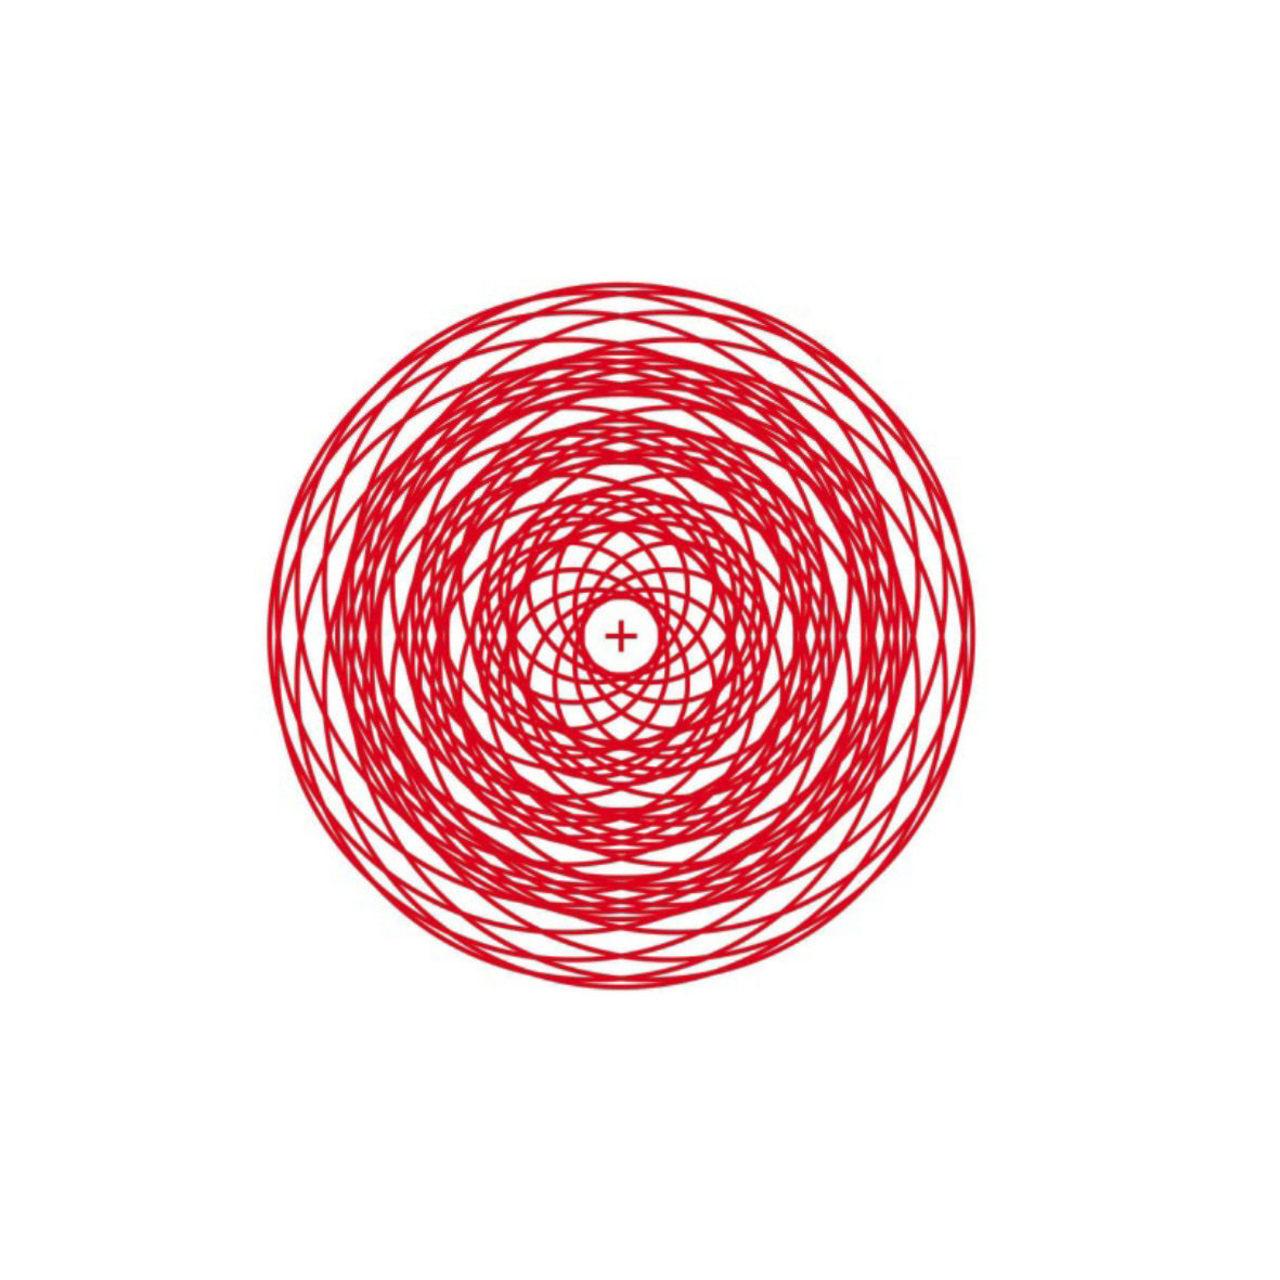 Nothing to chance  Smegs new Planetarium wash circle, line, spiral, white